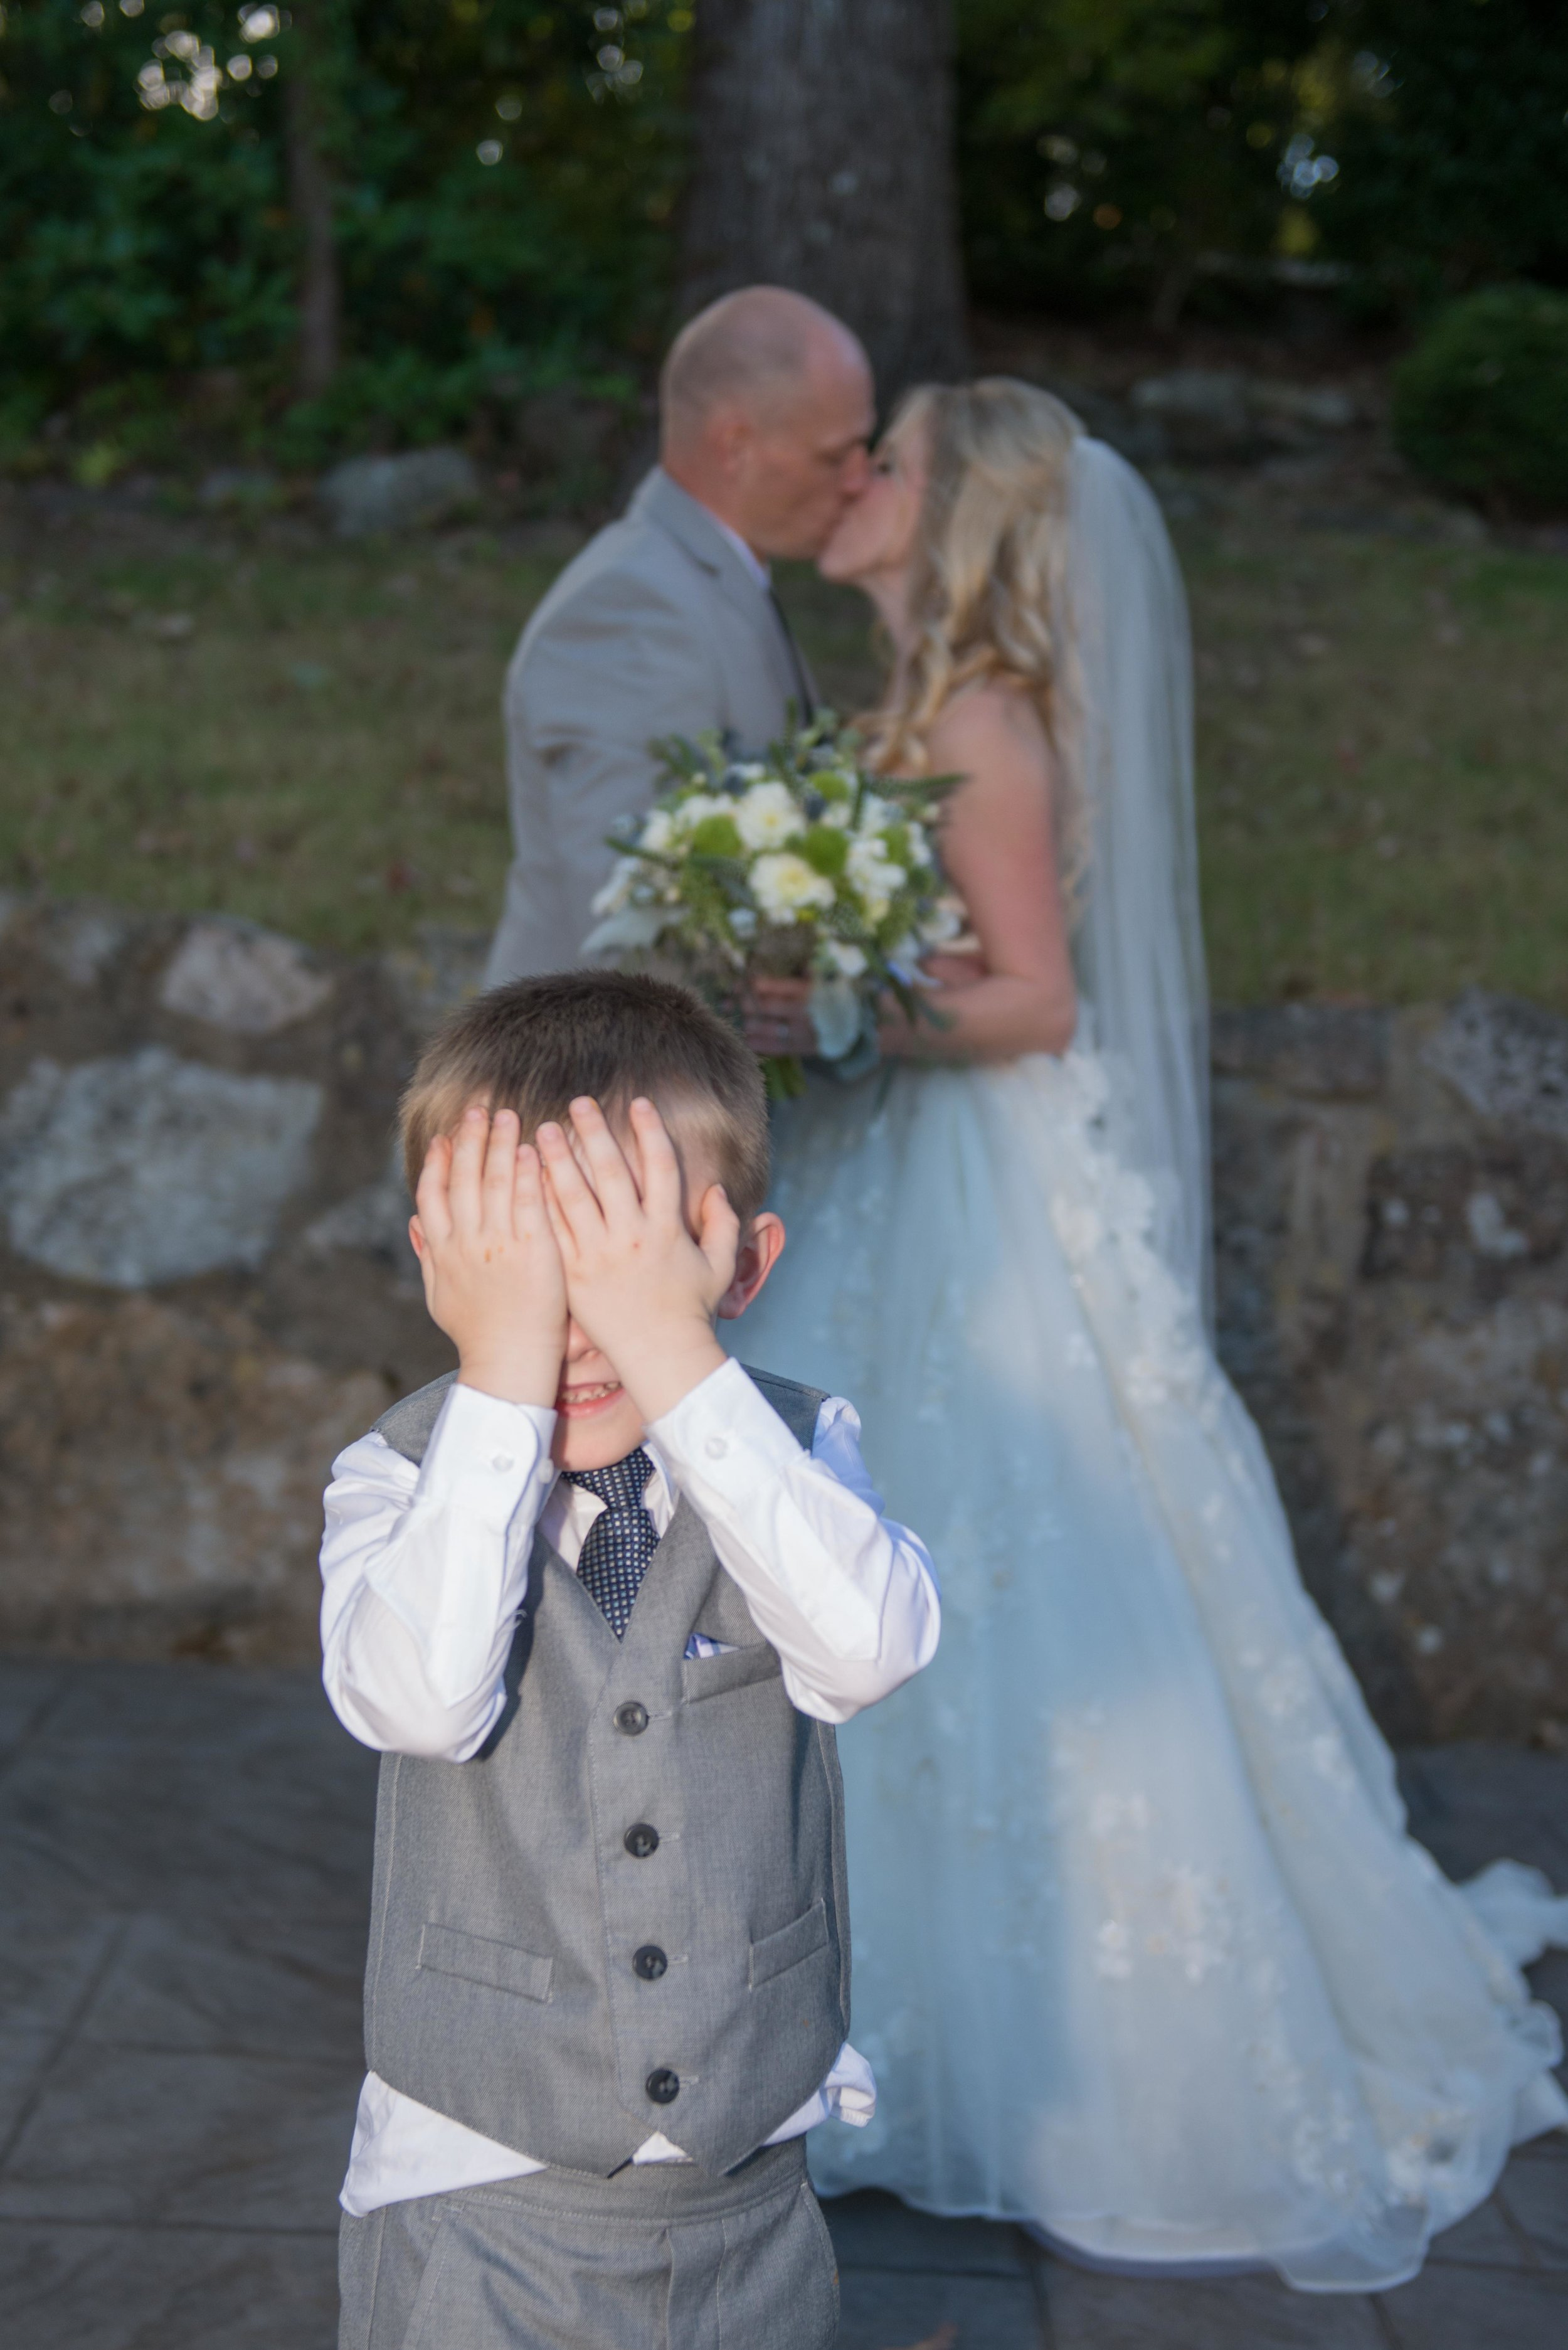 00001_Kuhnert-Wedding-66.jpg